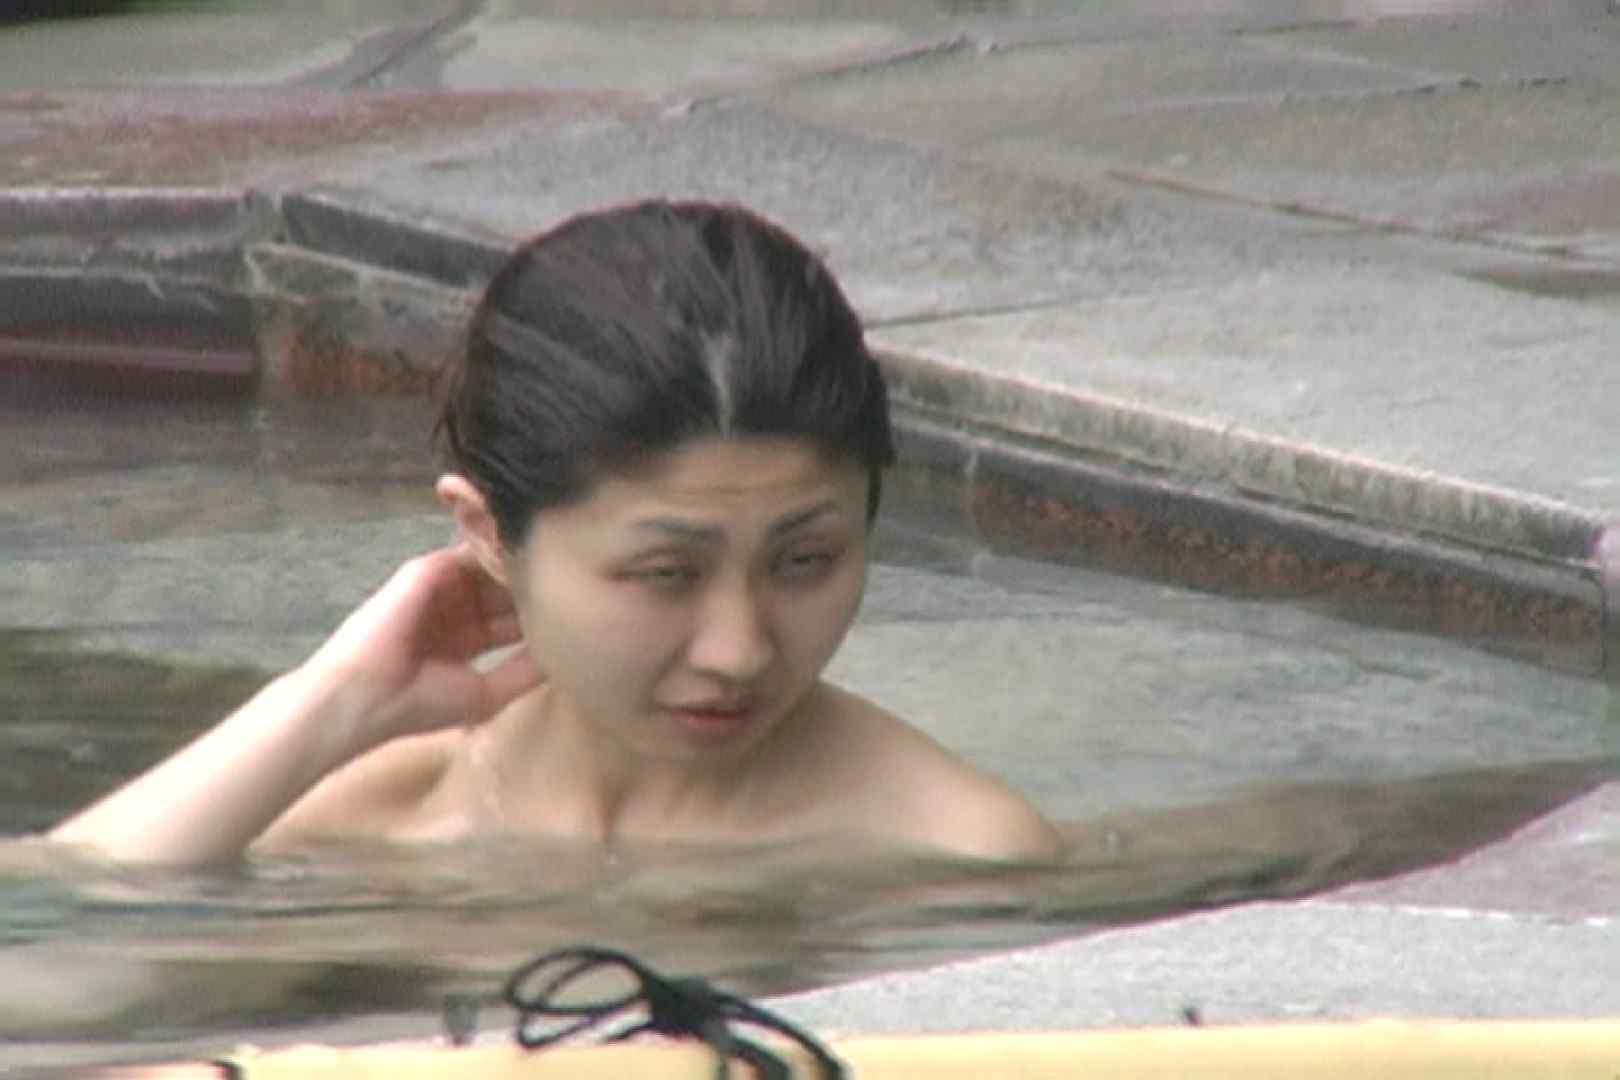 Aquaな露天風呂Vol.642 盗撮師作品 セックス画像 86pic 2